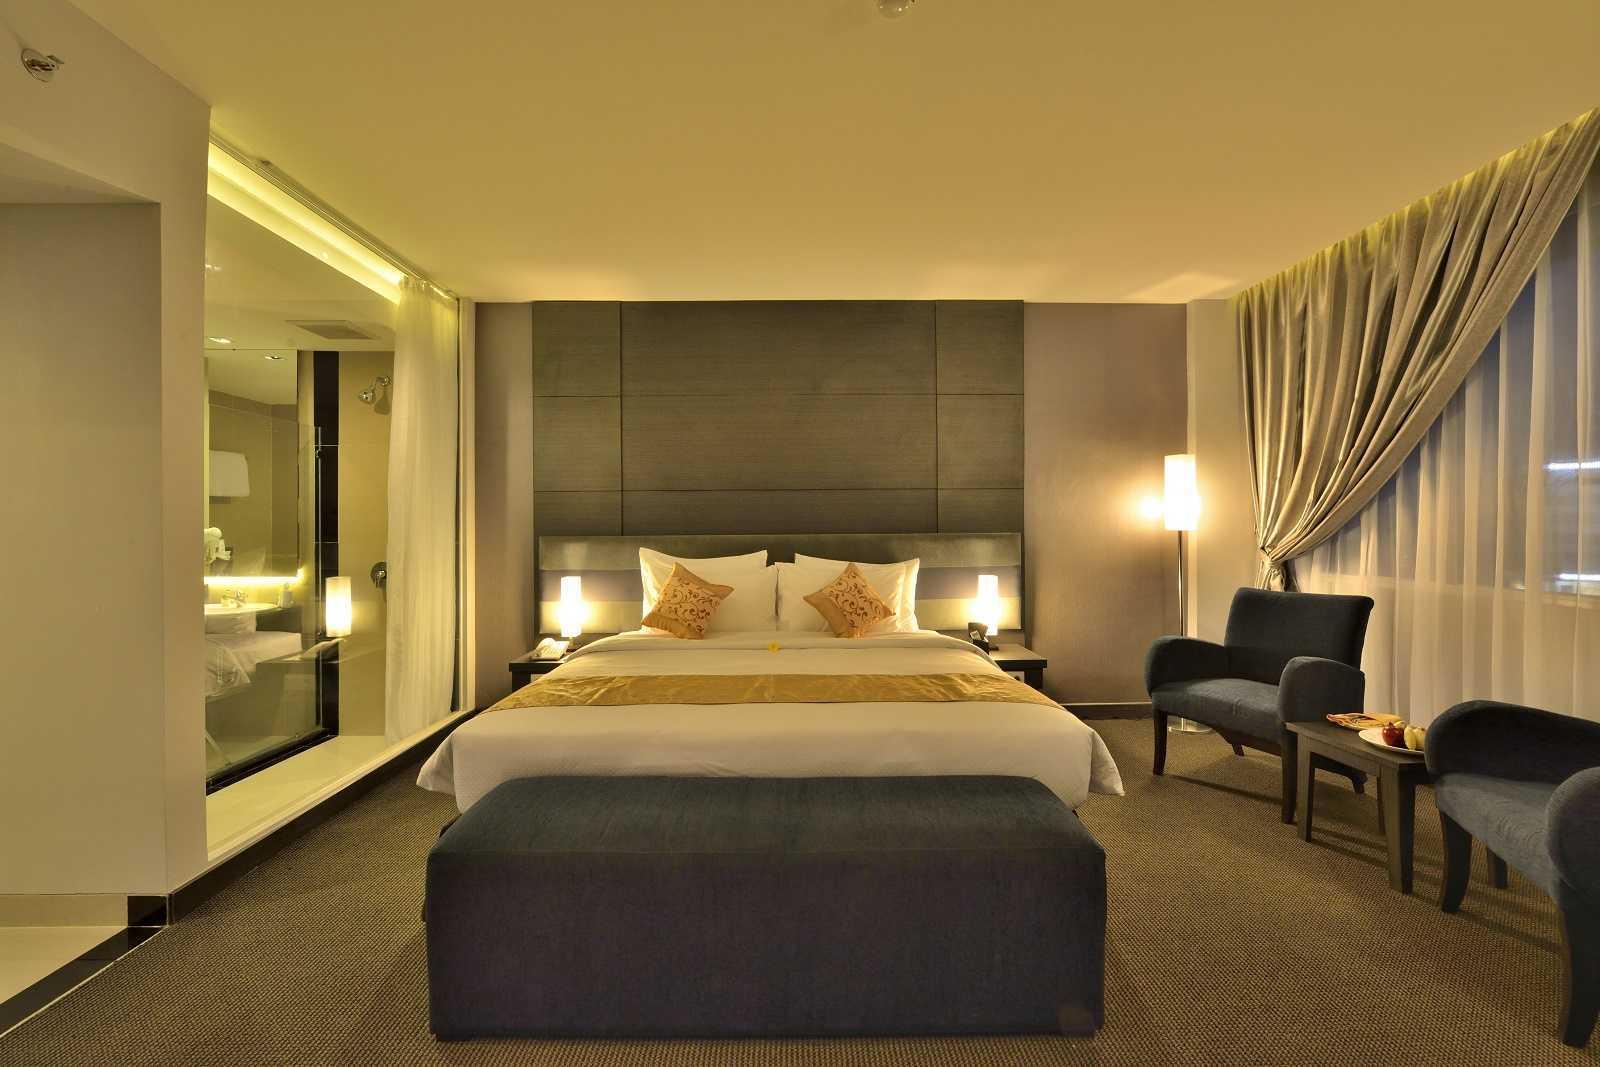 Melly Purnamahildha Tarman Grand Tjokro Pekanbaru Pekanbaru, Riau, Indonesia Pekanbaru, Riau, Indonesia Executive Room Modern Executive Room  (Image: Http://www.grandtjokro.com/hotel-Grand-Tjokro-Pekanbaru-In-Pekanbaru/photos/) 20455